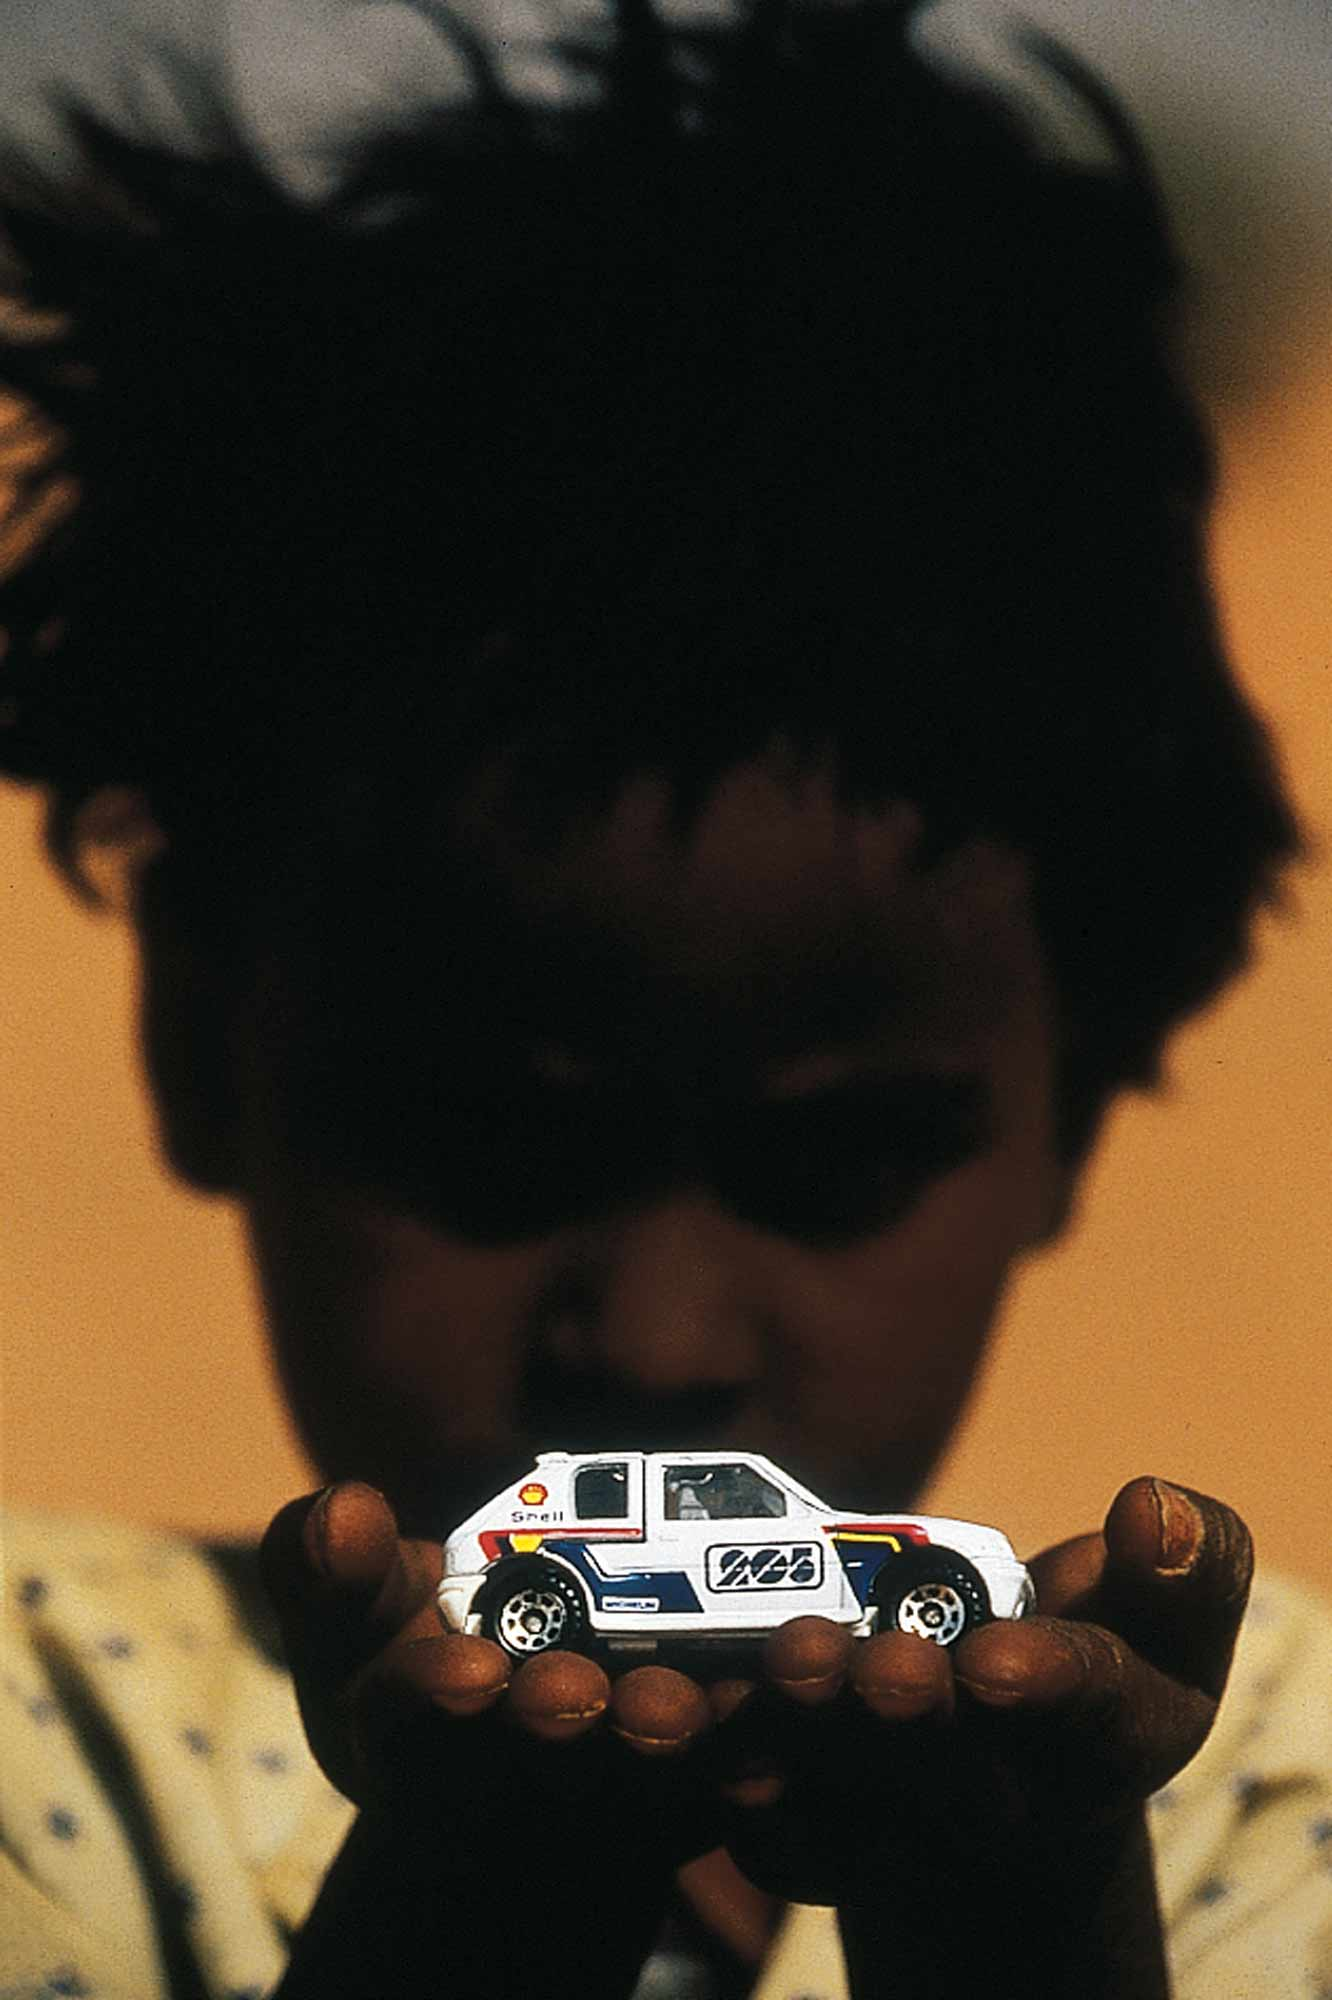 The Dakar - Yann Arthus-Bertrand